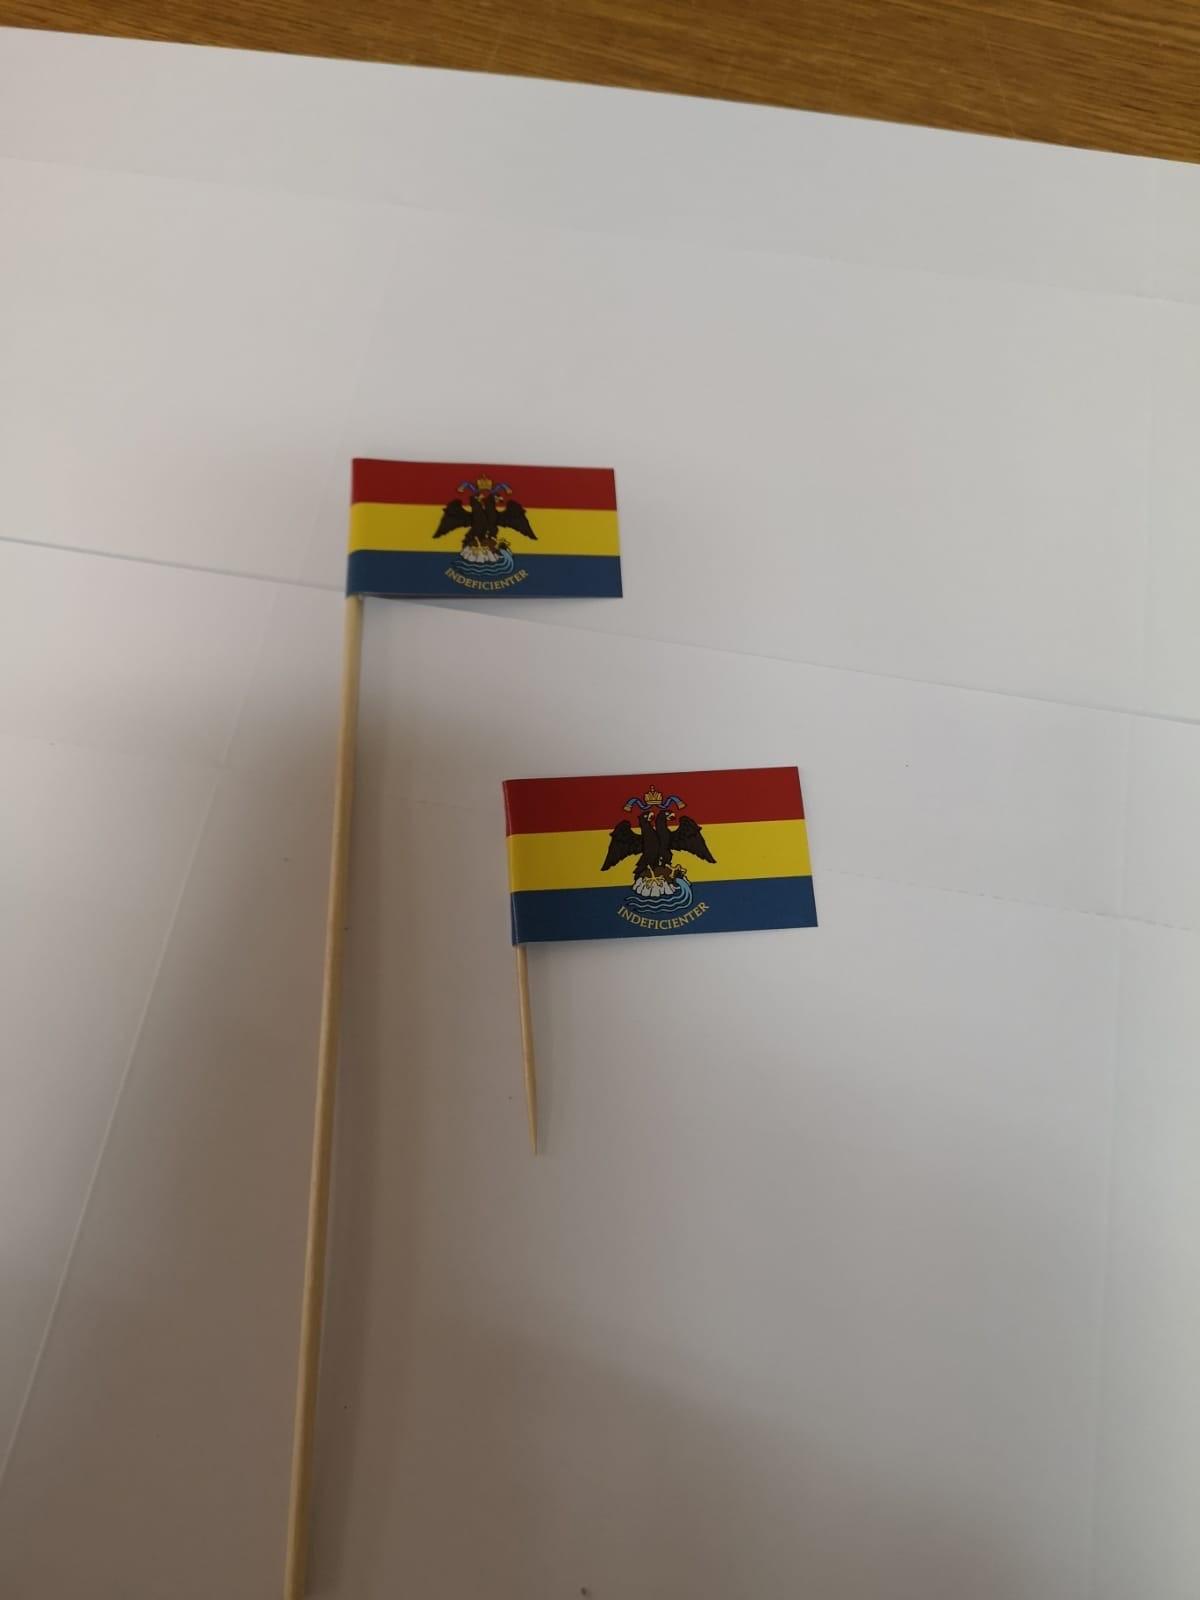 Zastavice na čačkalici